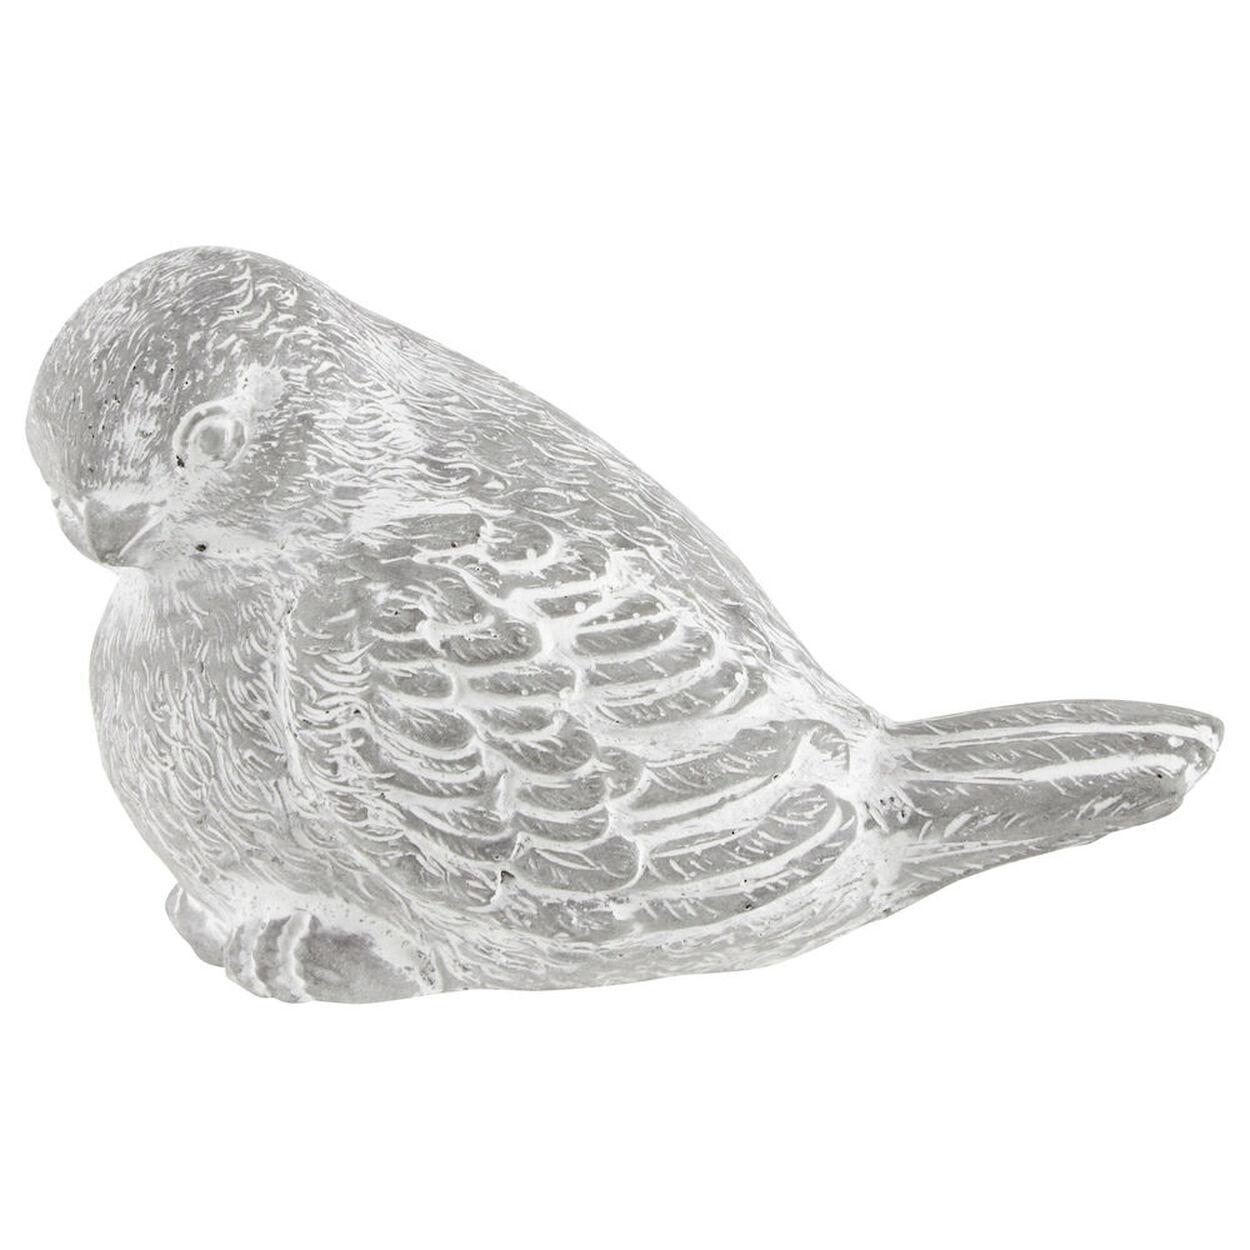 Decorative Cement Bird